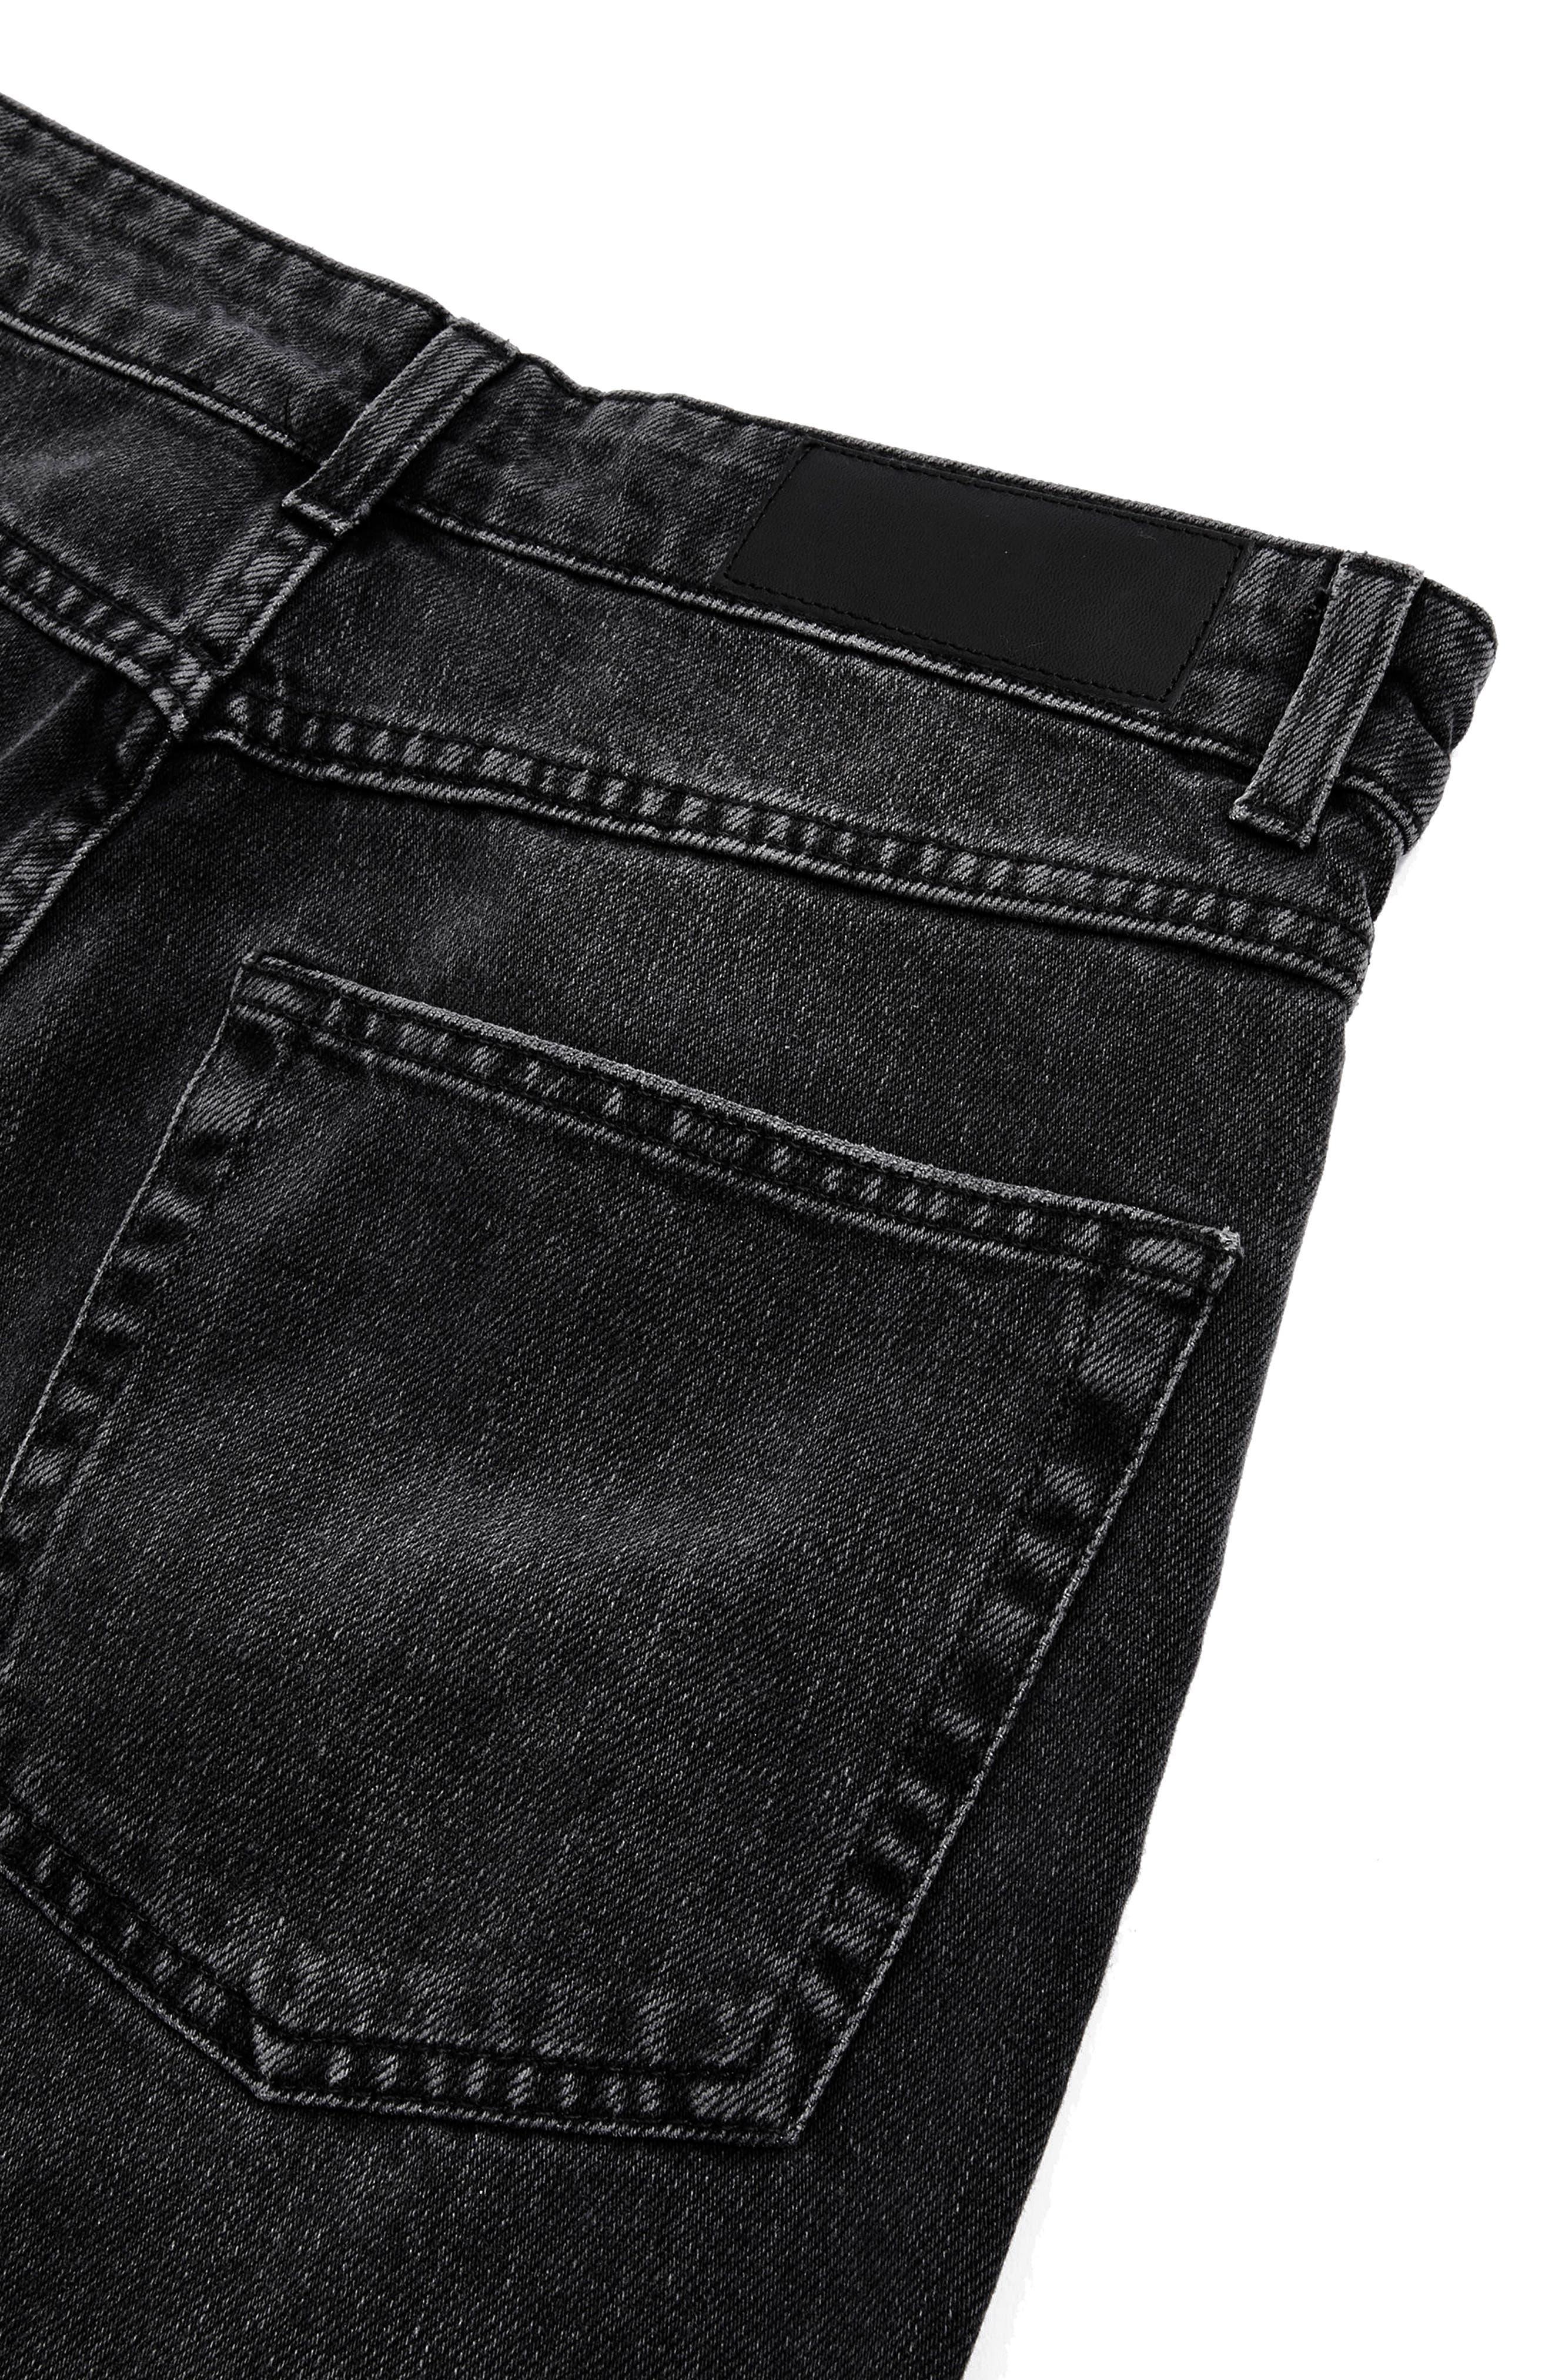 Washed Black Moto Straight Leg Jeans,                             Alternate thumbnail 2, color,                             003